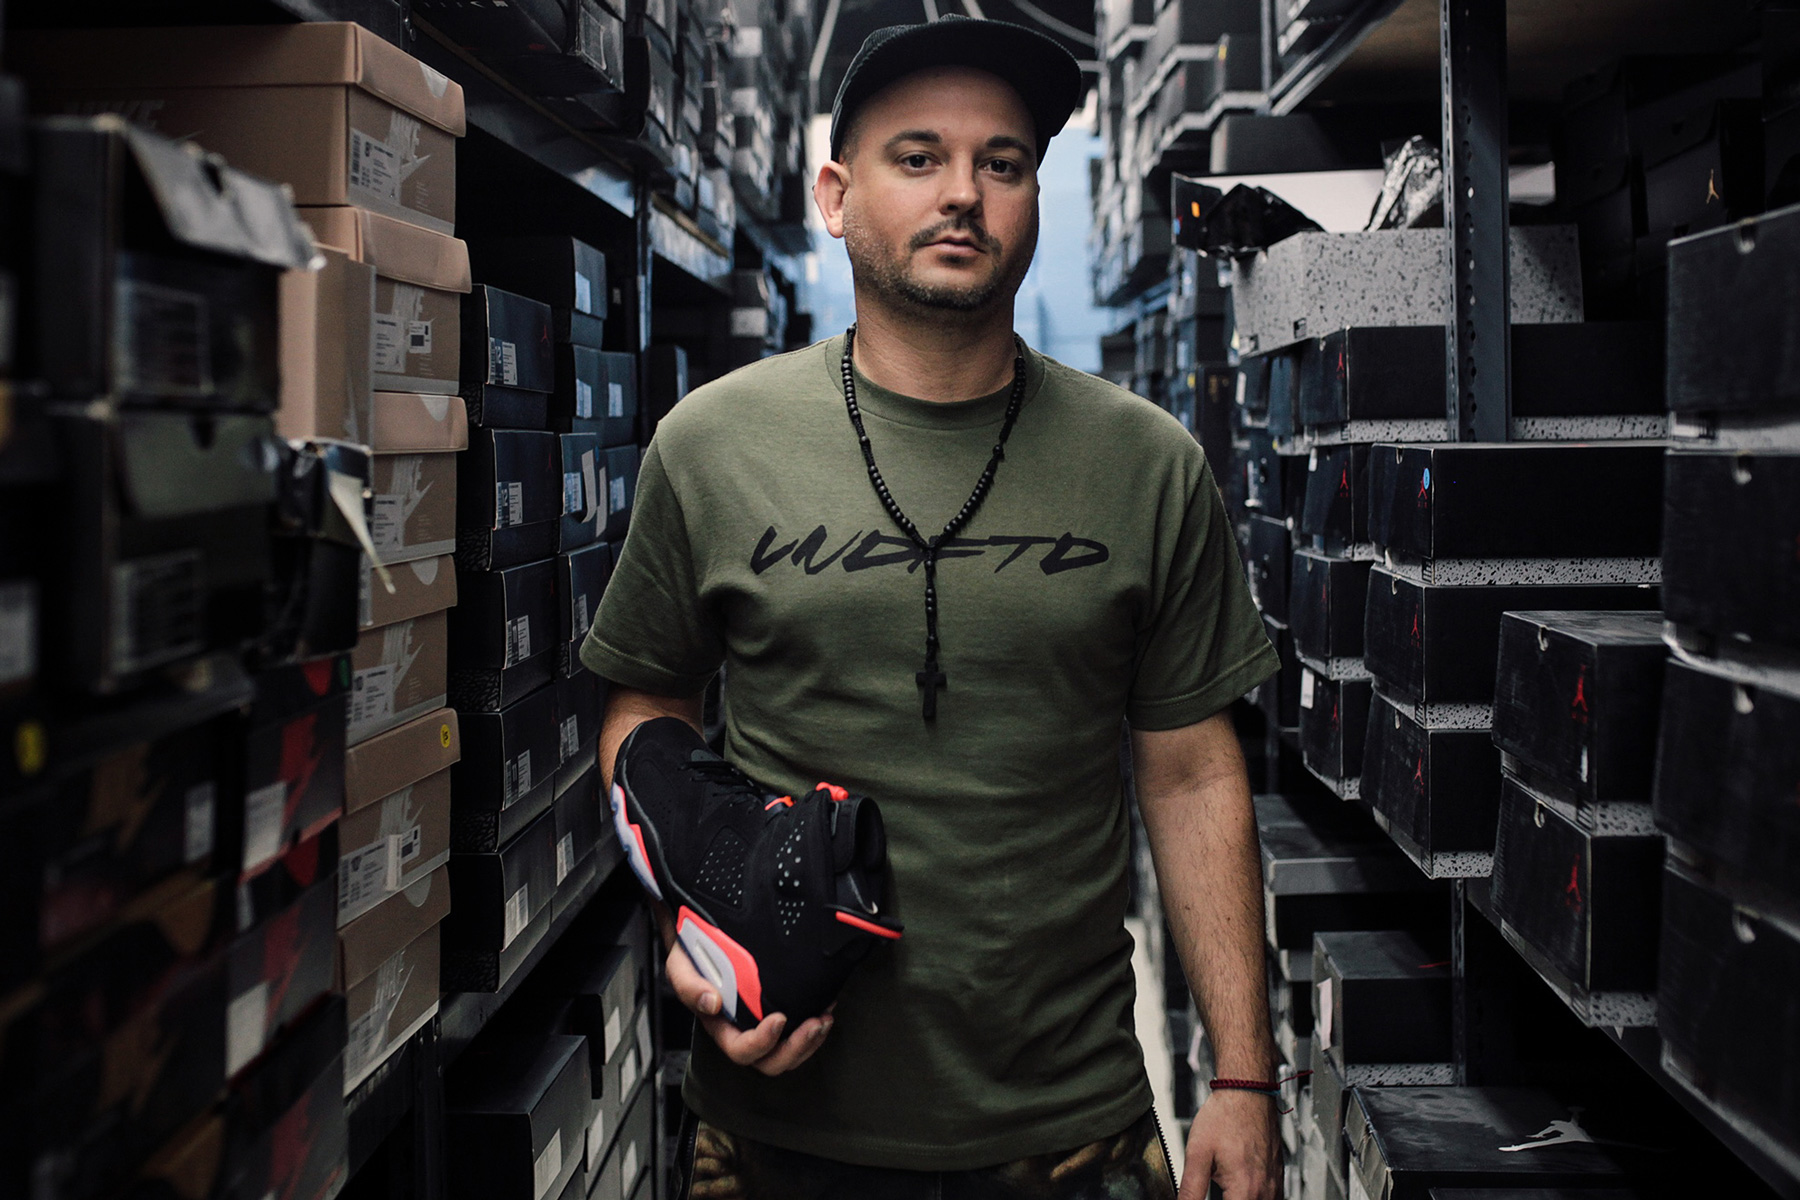 Curators versus Resellers: Croatianstyle Dissects the Sneaker Market